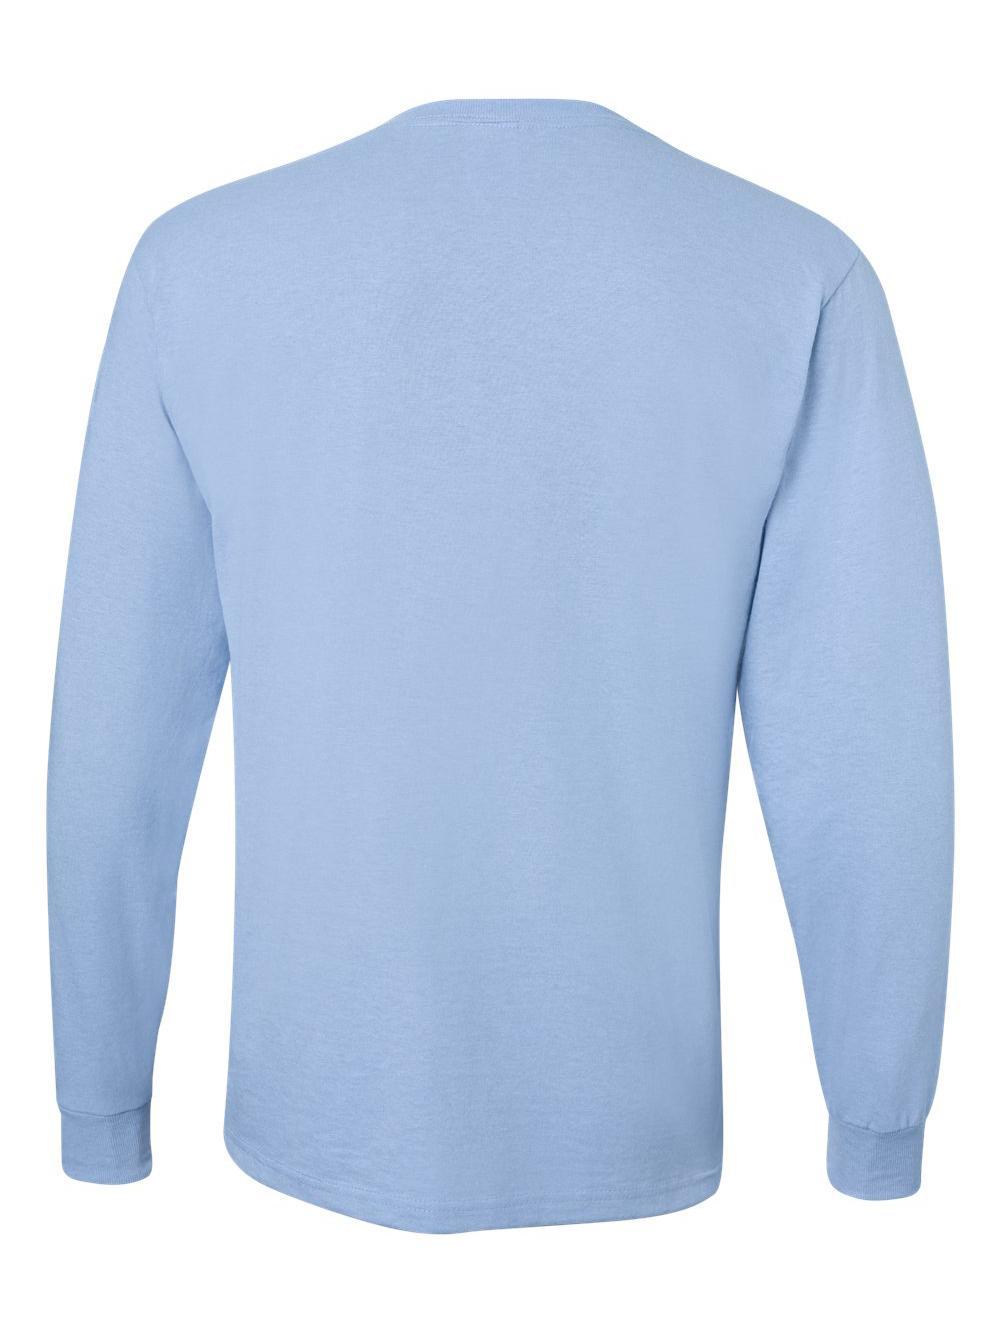 Jerzees-Dri-Power-Long-Sleeve-50-50-T-Shirt-29LSR thumbnail 55